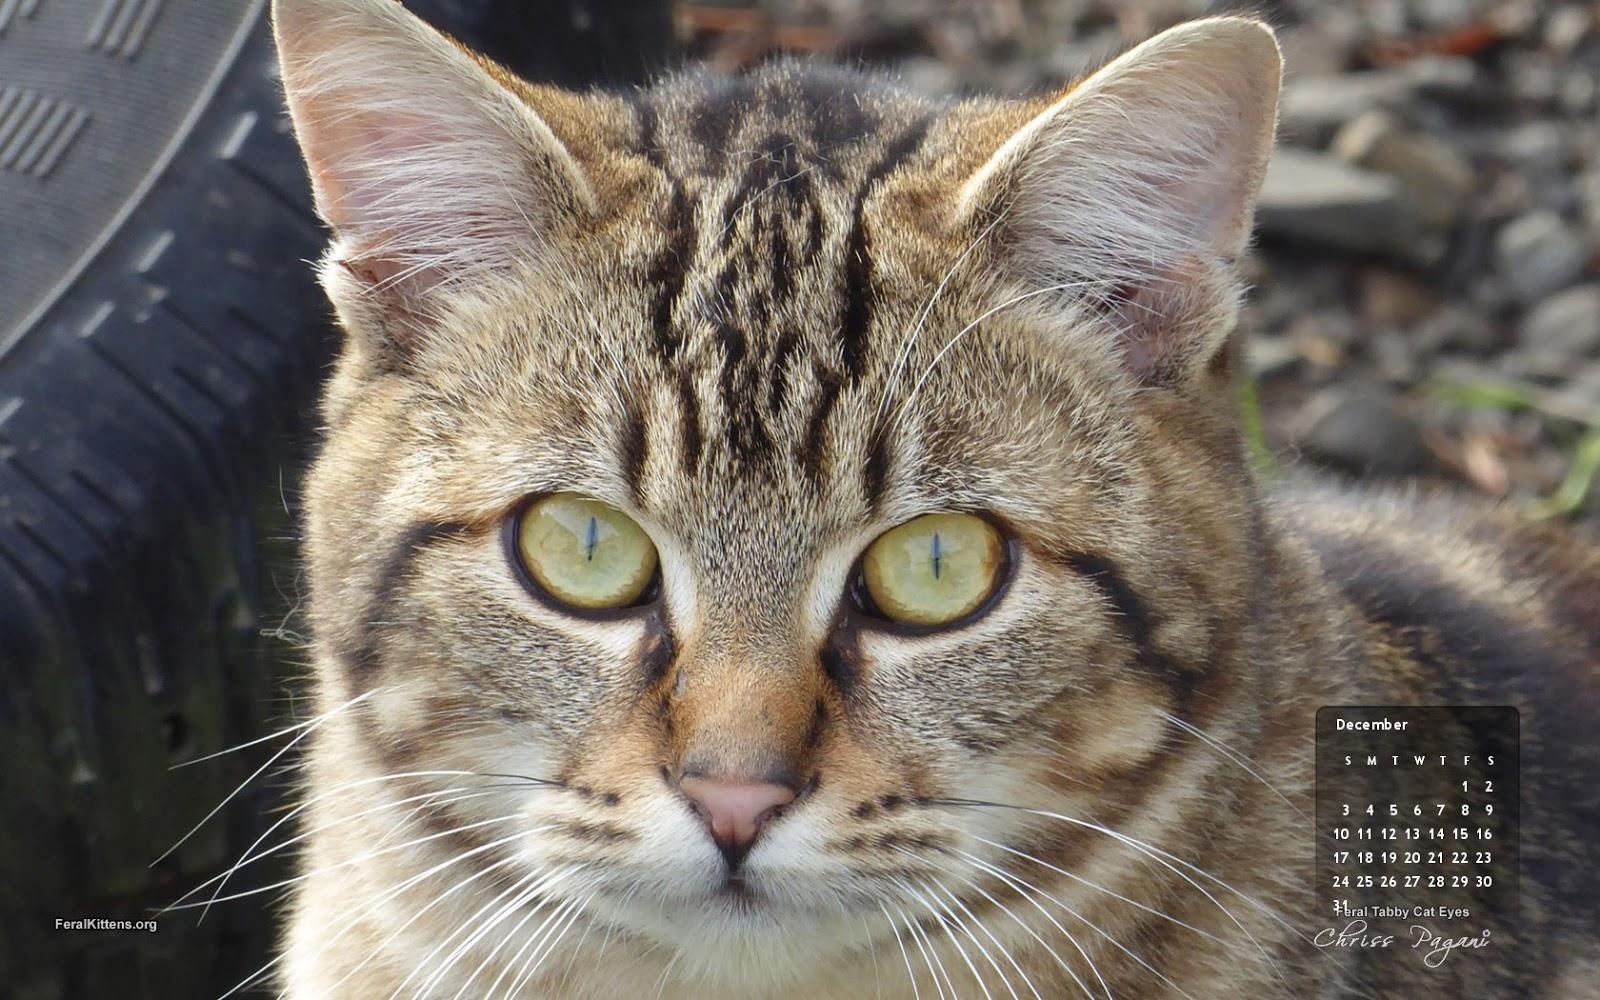 Must see Wallpaper Macbook Cat - December-16x10  Snapshot_282930.jpg